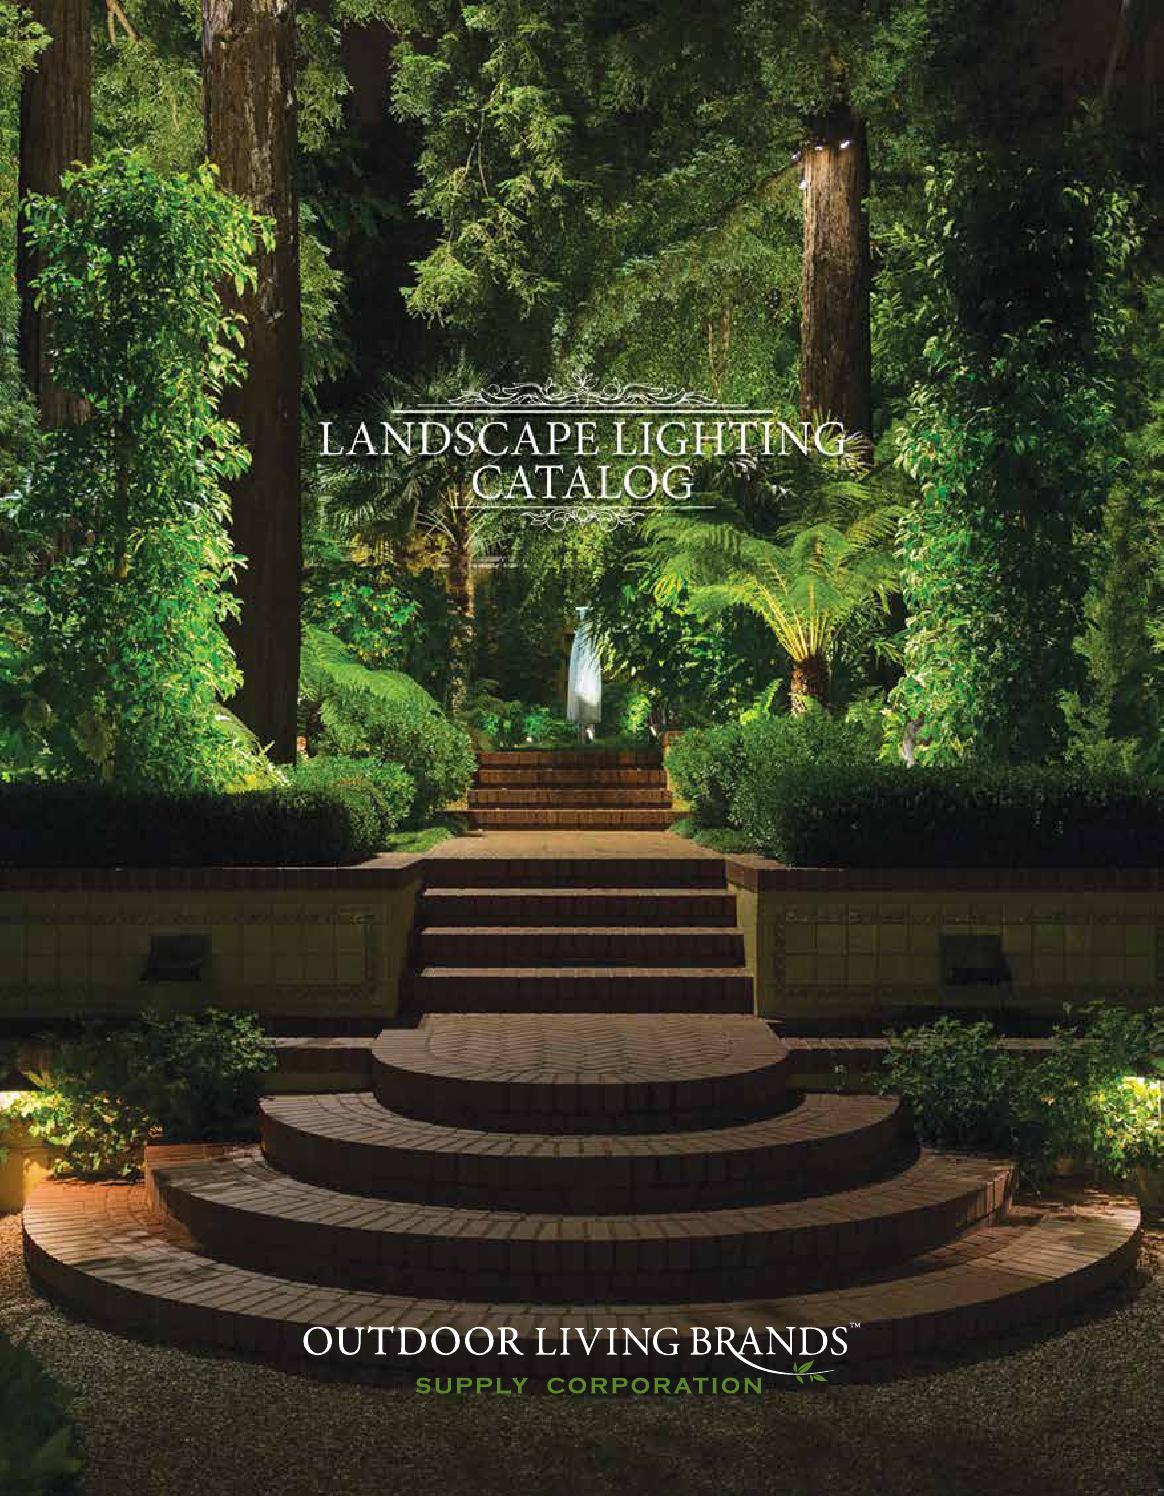 Outdoor Living Brands : 2016 Landscape Lighting Catalog by Outdoor Living Brands ...